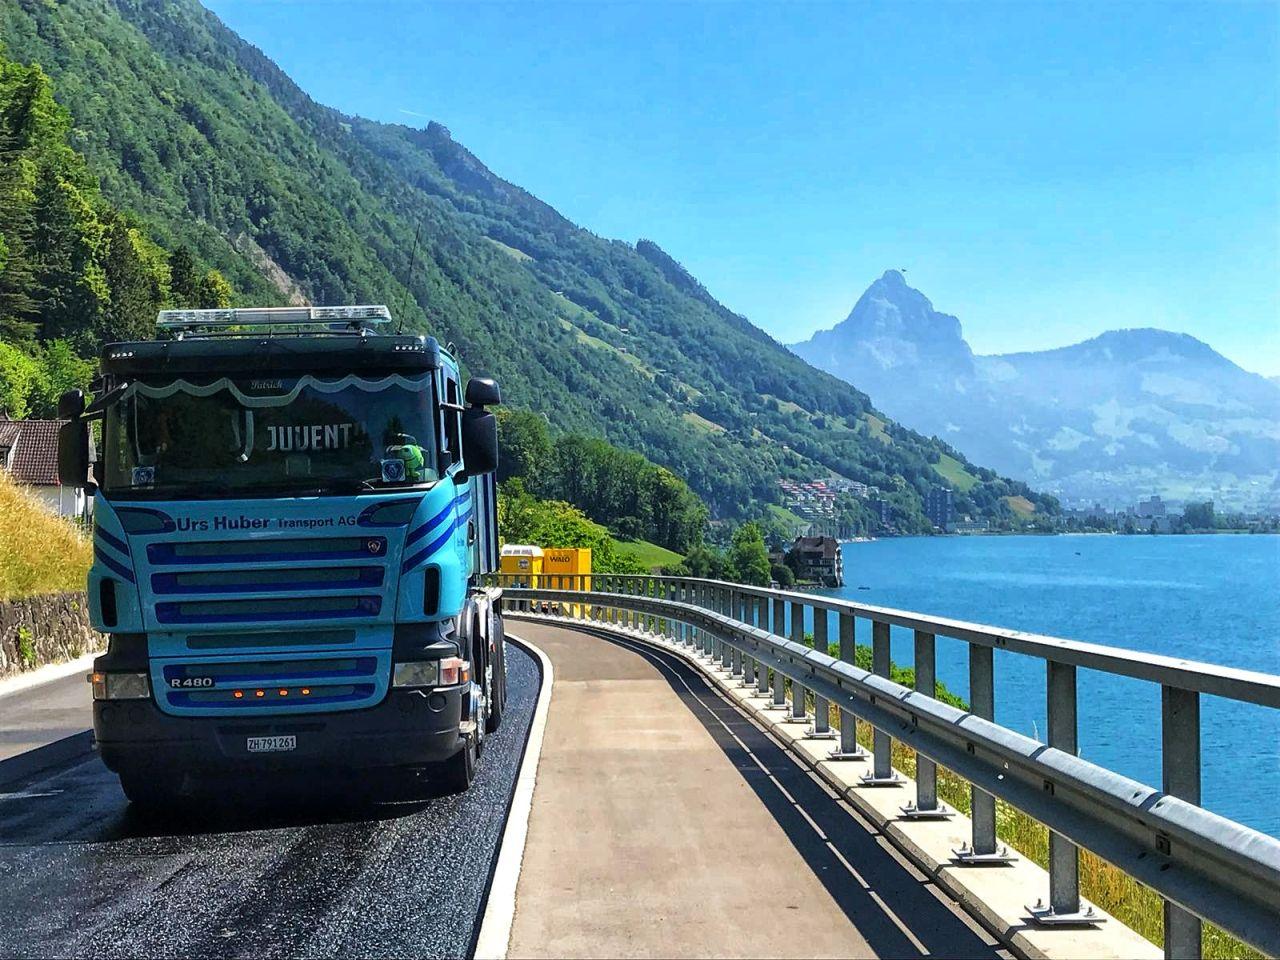 5-Achs-Thermofahrzeug, Kipper Urs Huber Transport AG 5